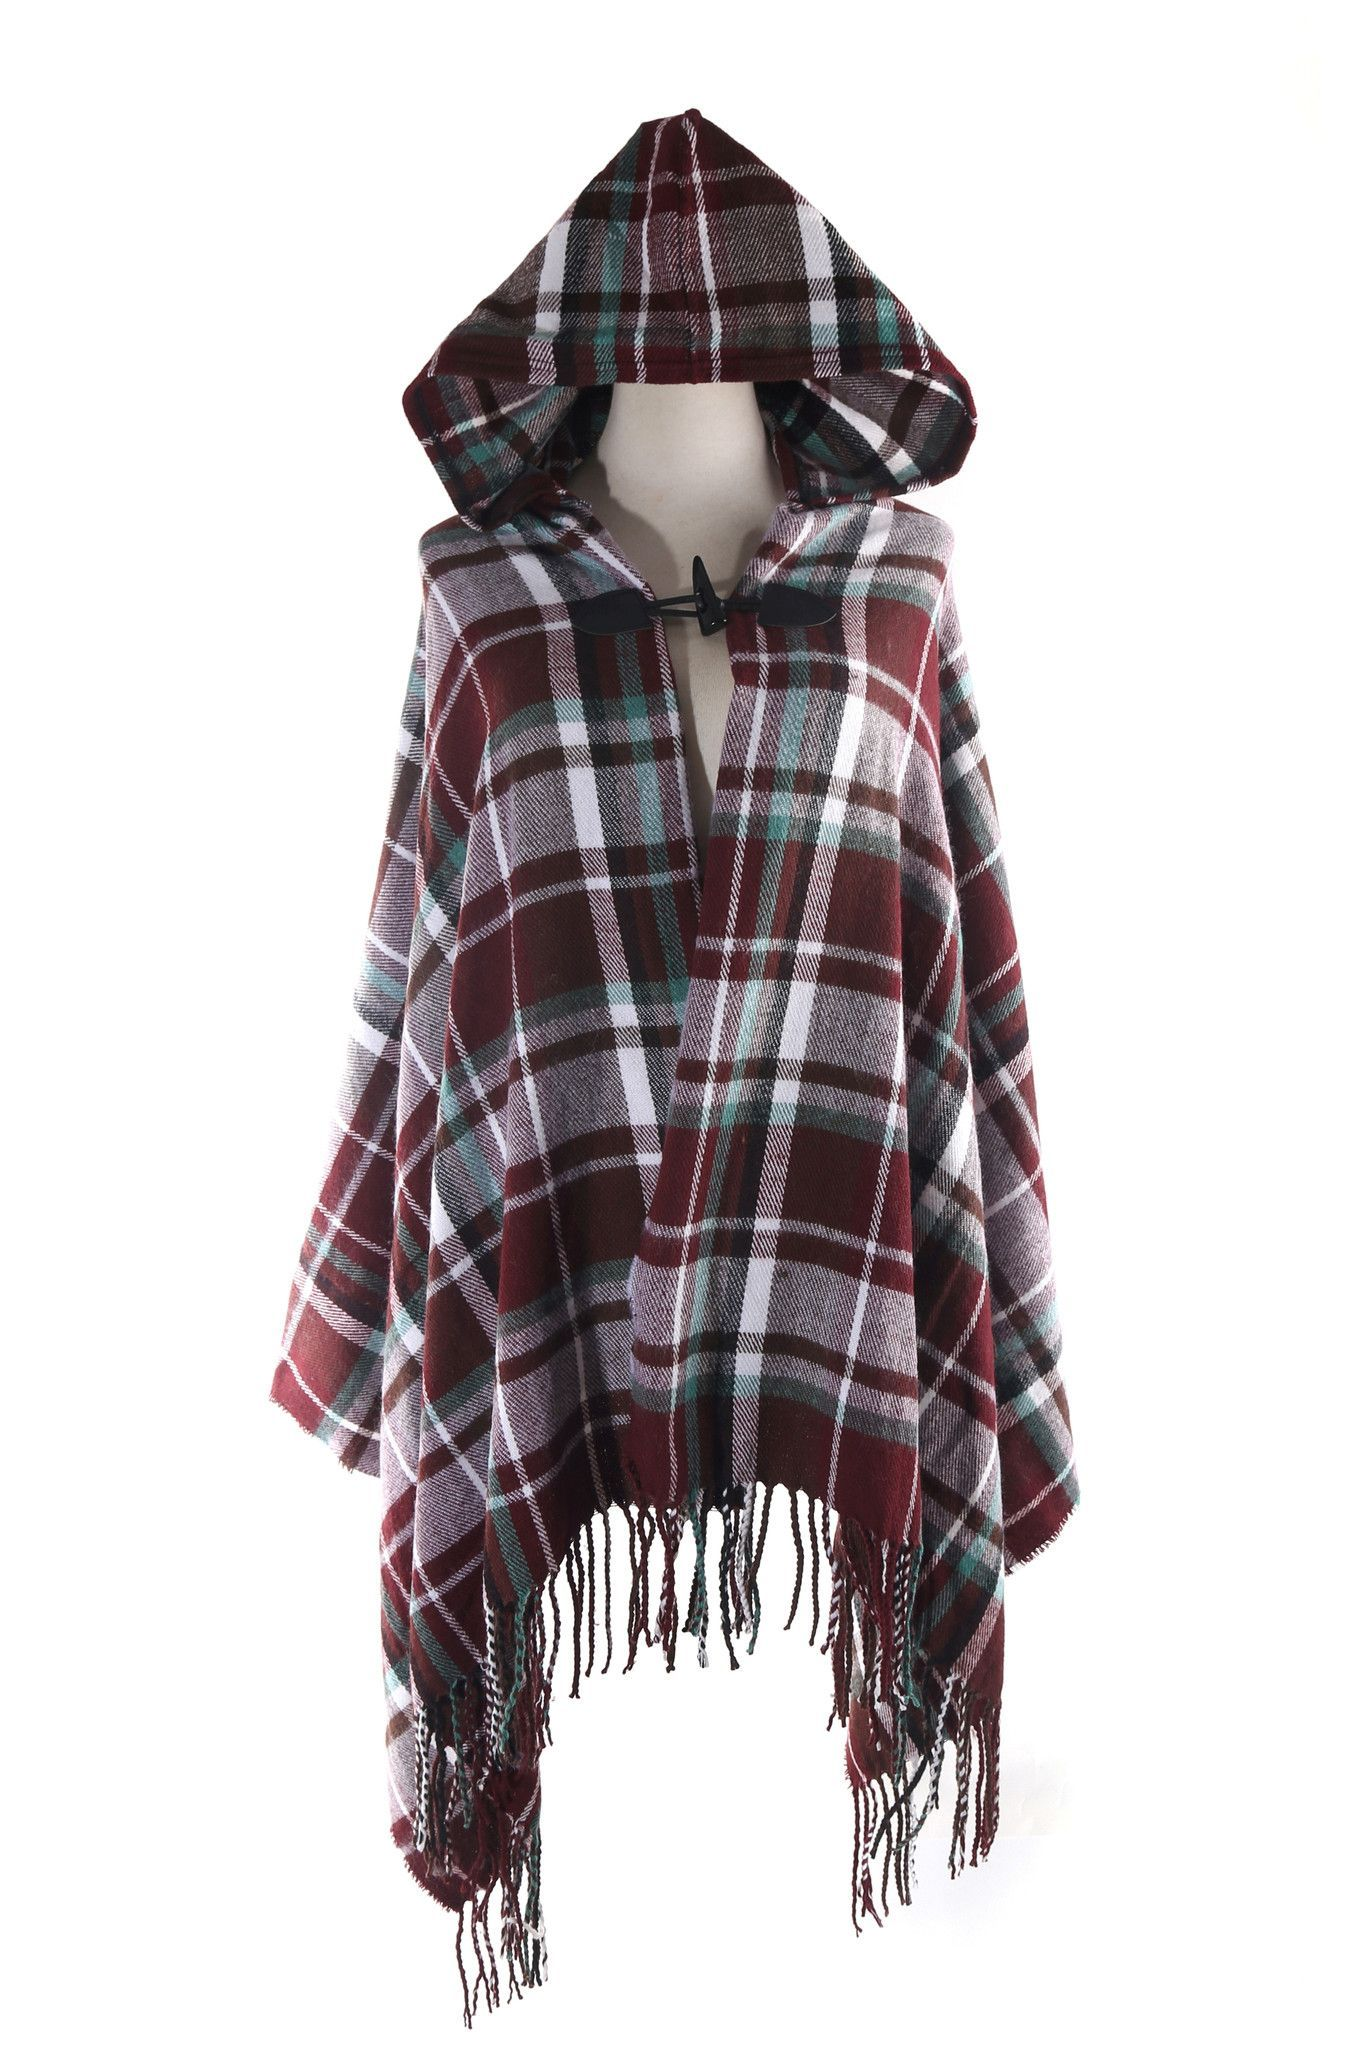 Red and black flannel cardigan  Tartan Plaid Soft Hooded Cardigan  ponchos  Pinterest  Hooded